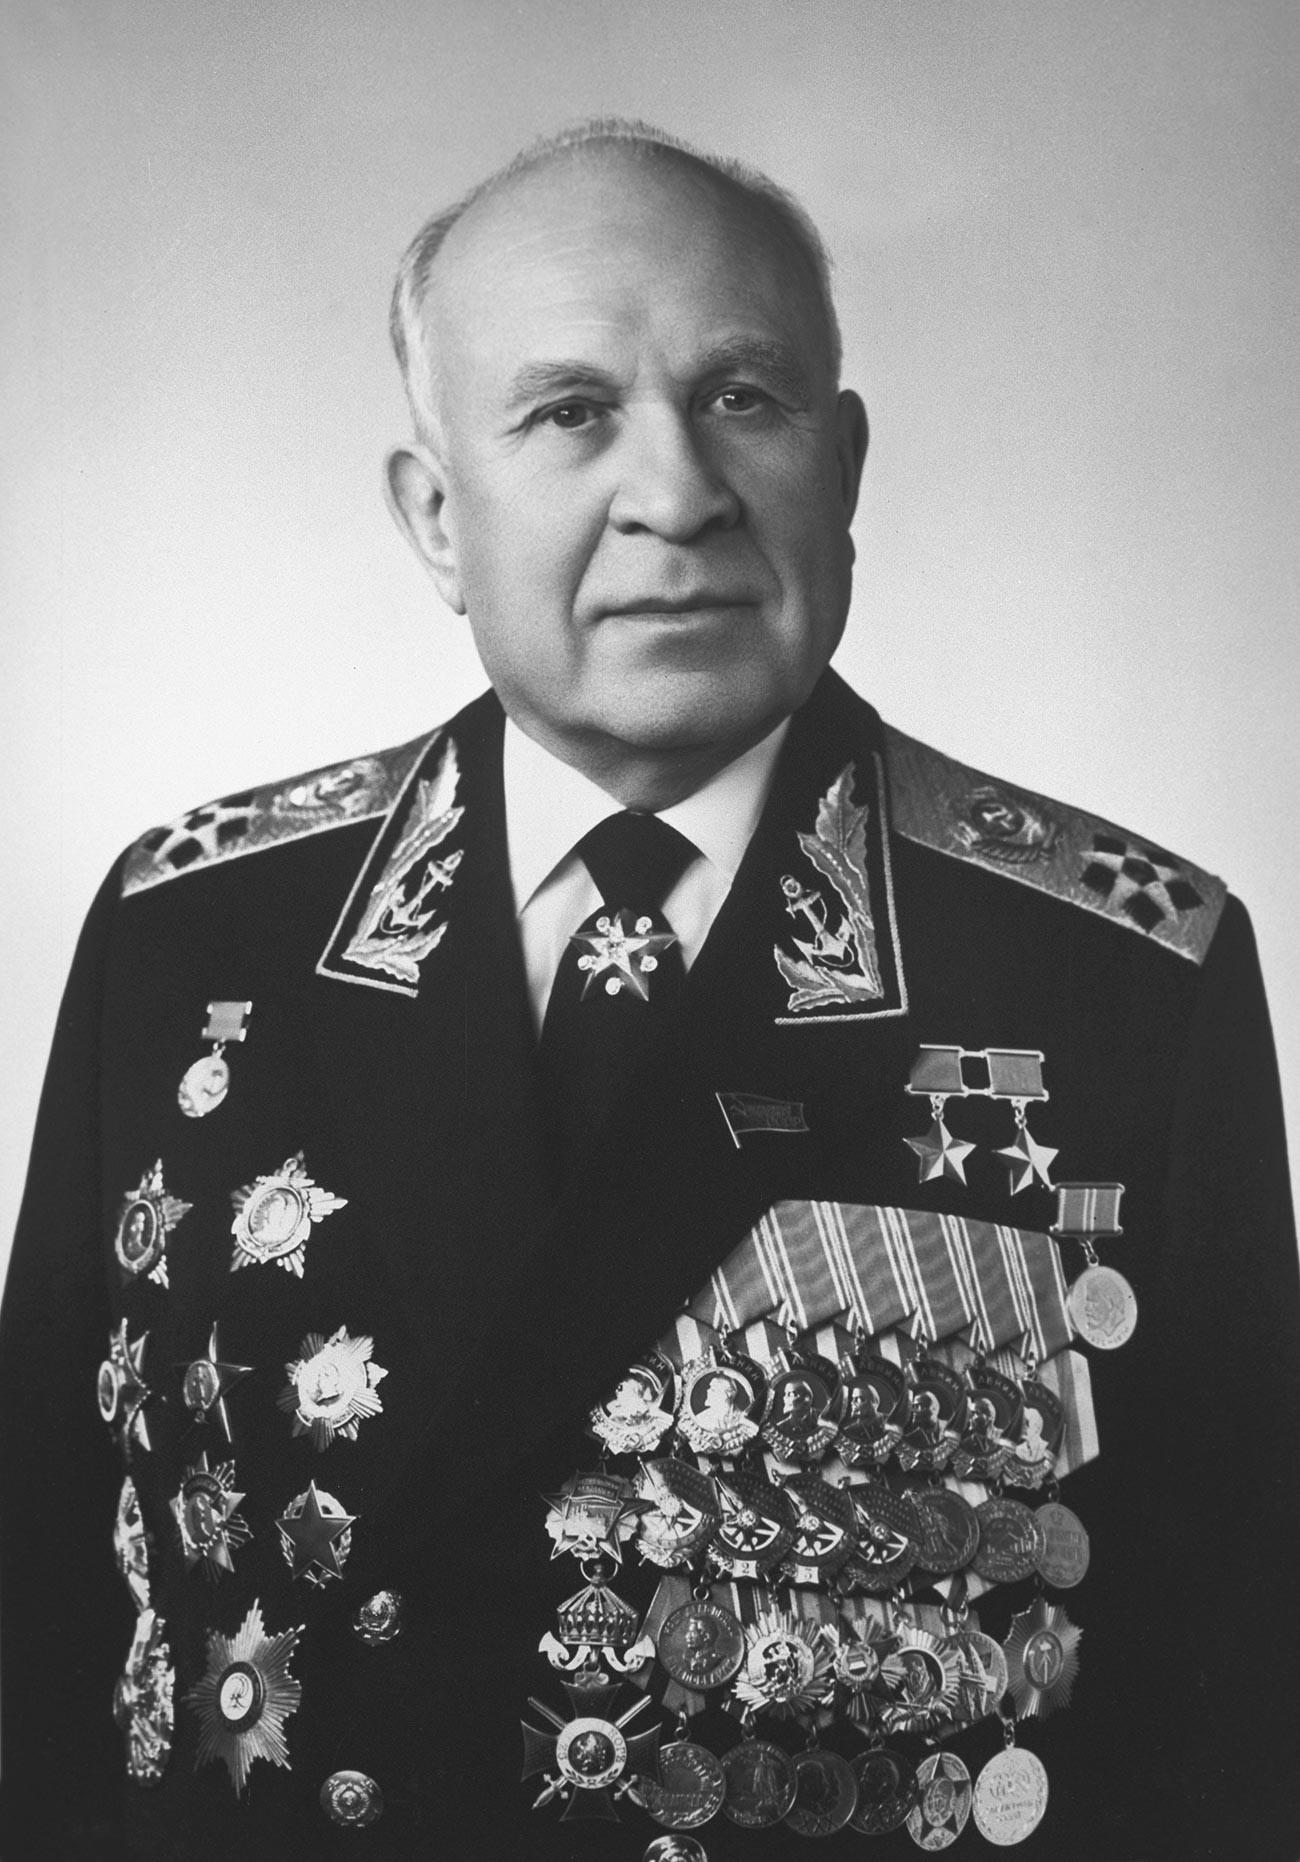 Sergei Gorschkow